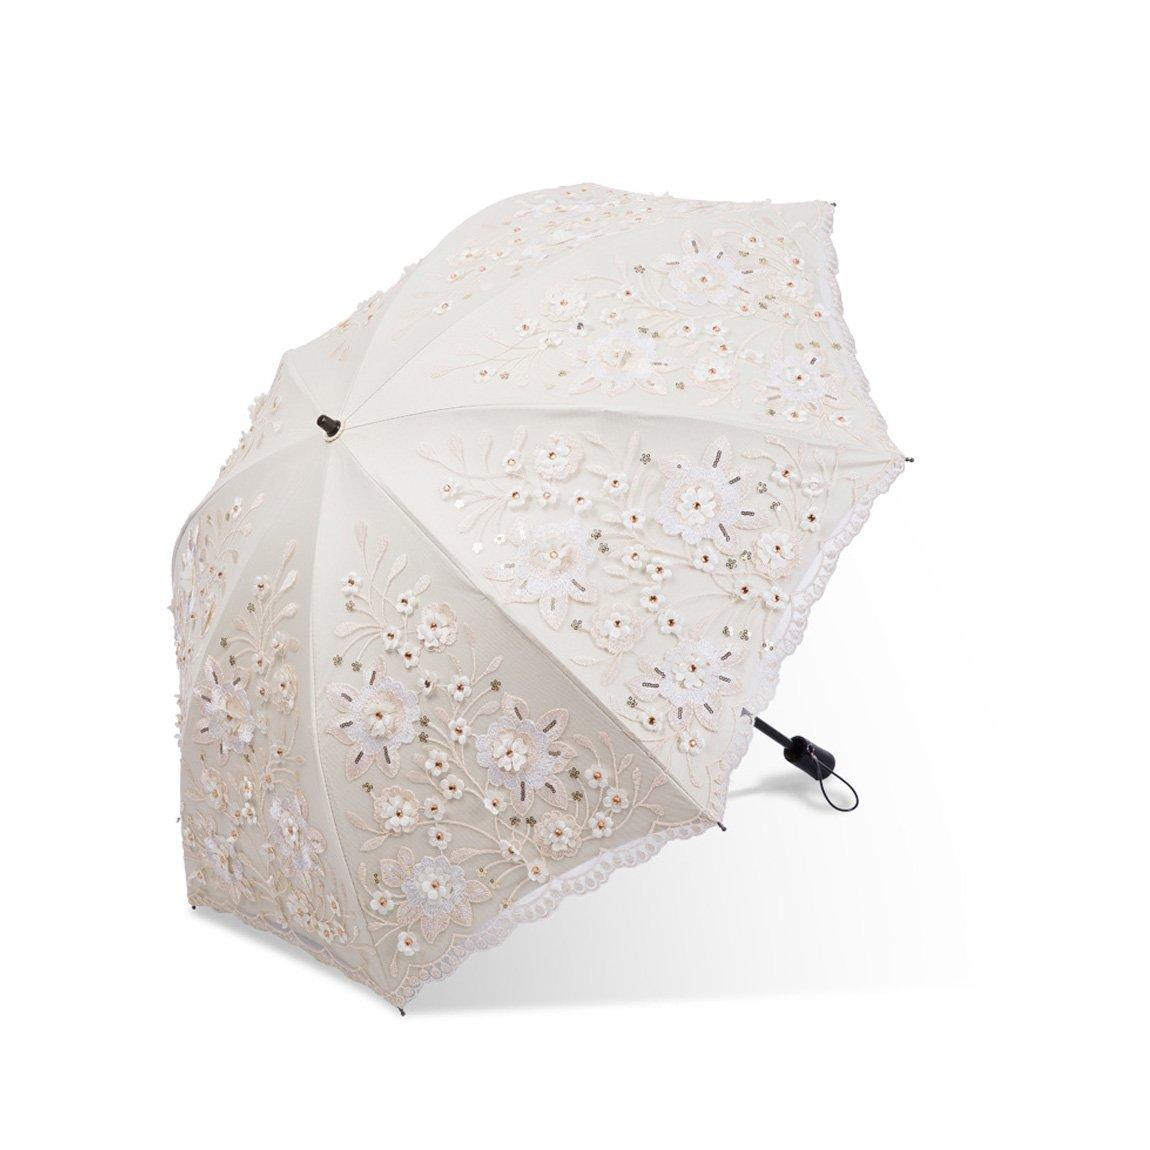 GWM 折る傘、黒い中紫外線防止層パラソル33CMの中の密集したレース旅行日曜日の保護 (Color : Beige) B07TF8V9GW Beige